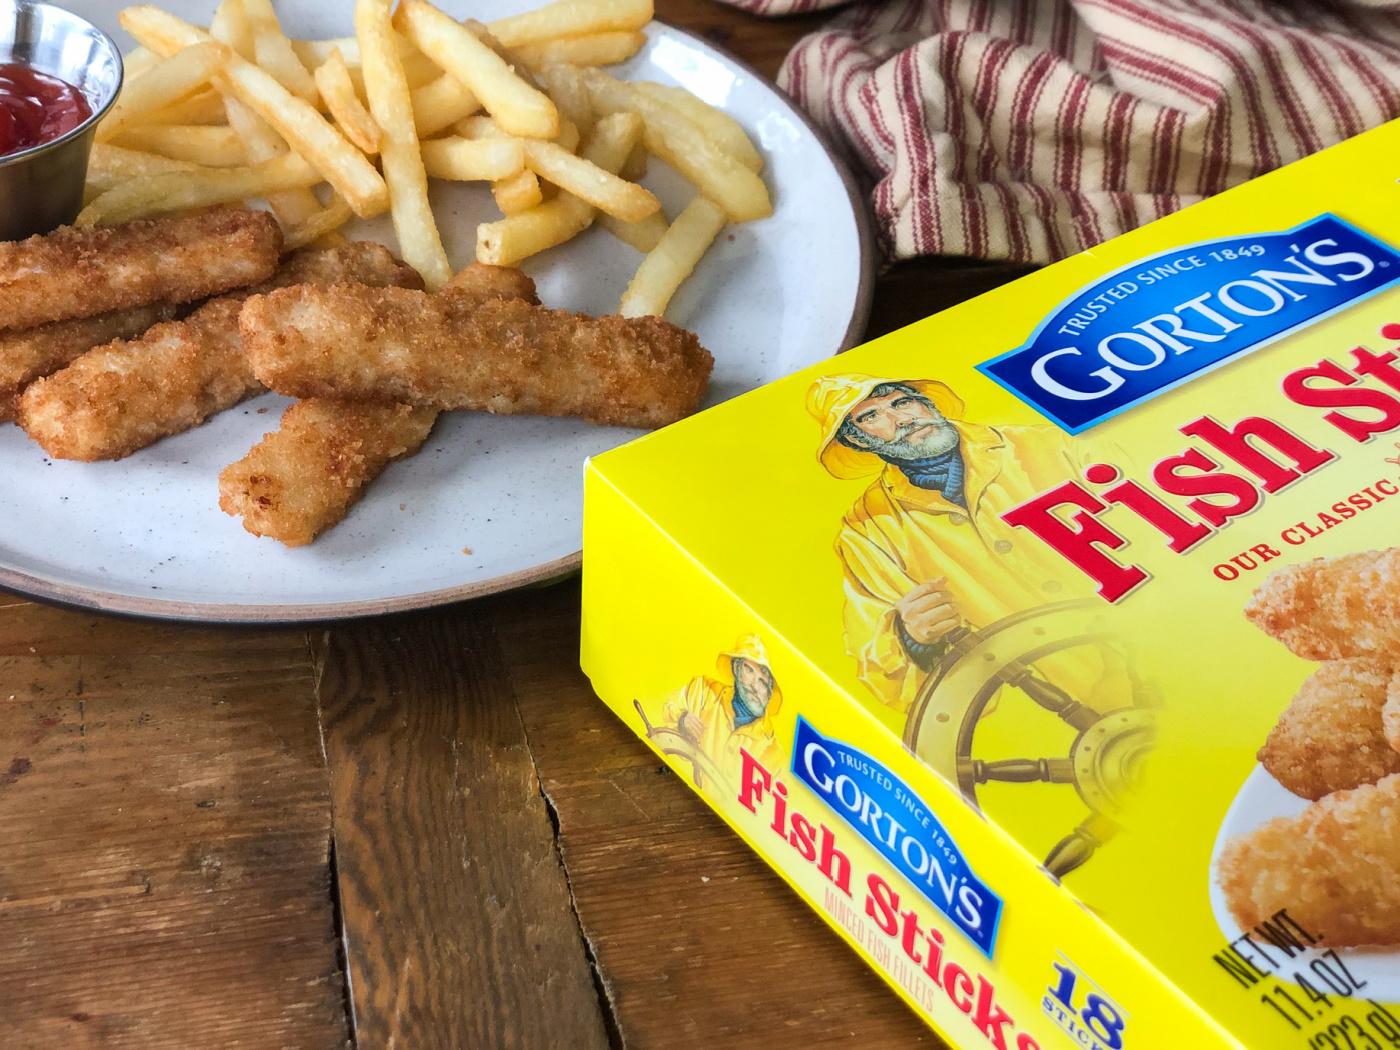 Gorton's Fish Fillets or Sticks As Low As $1.85 At Publix on I Heart Publix 1